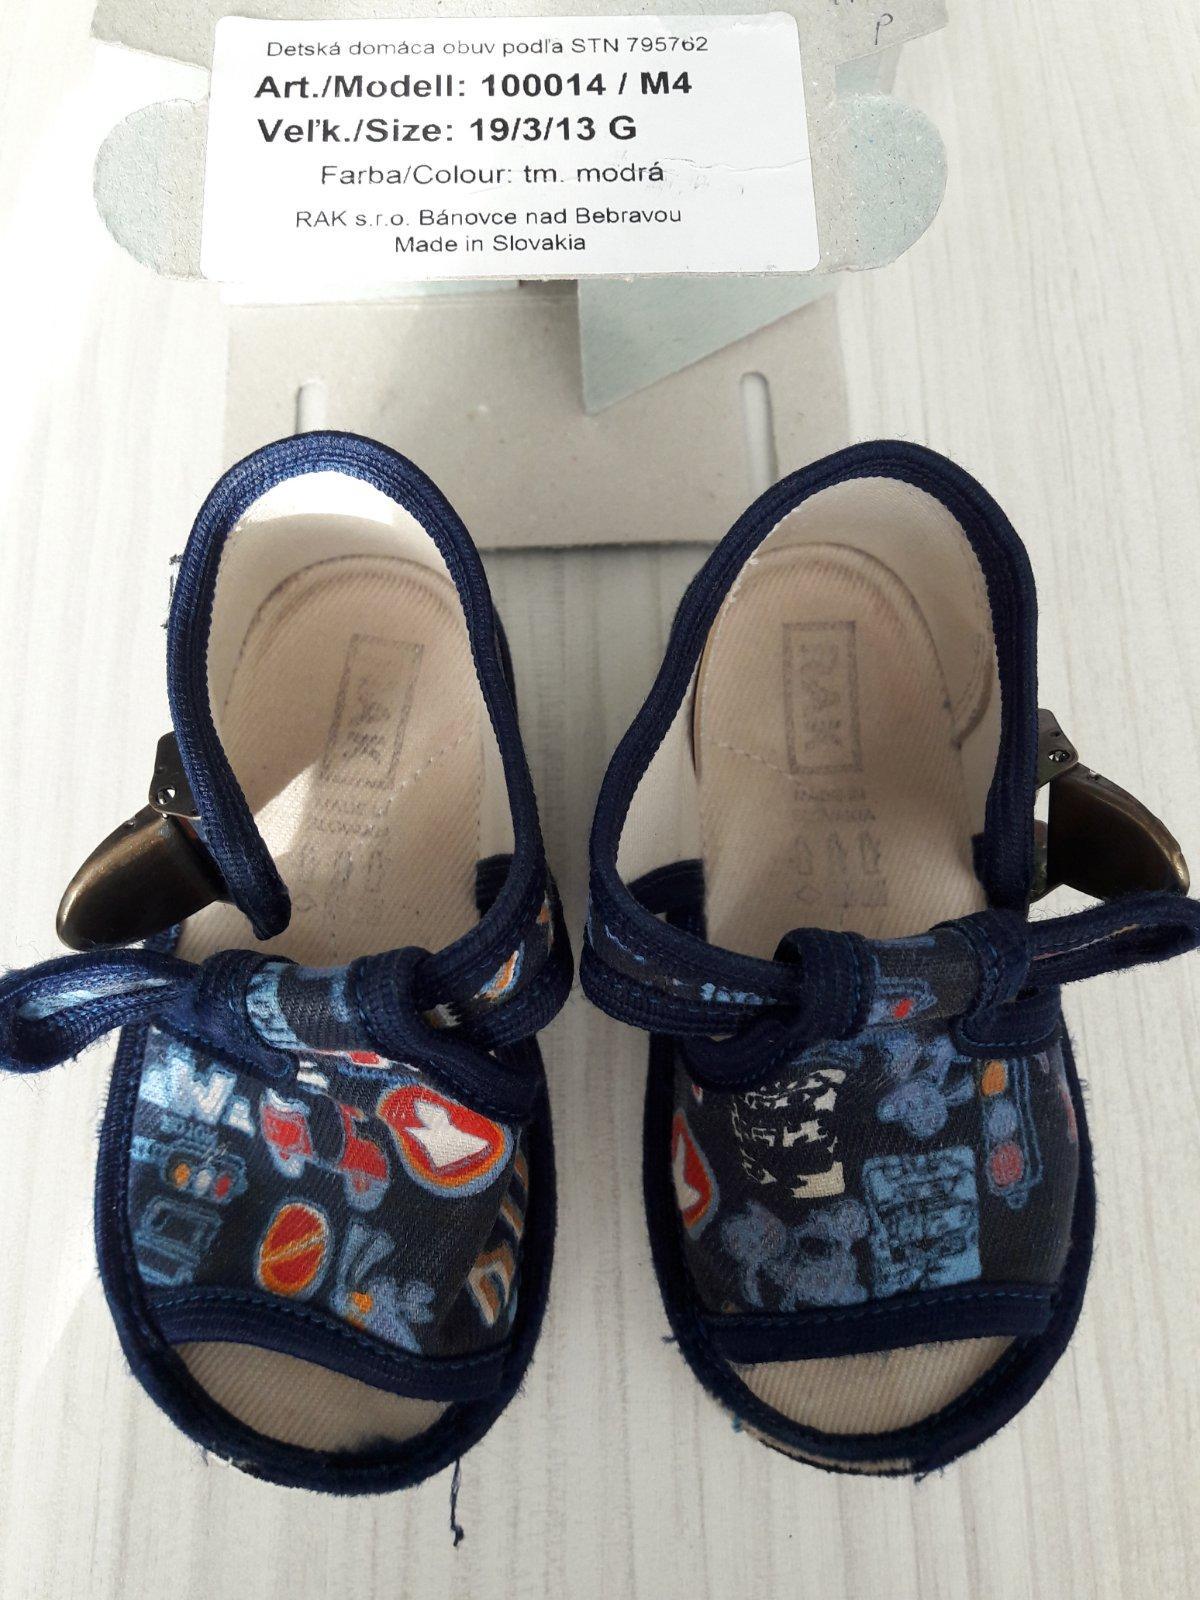 06677f64de Chlapcenske papuce rak